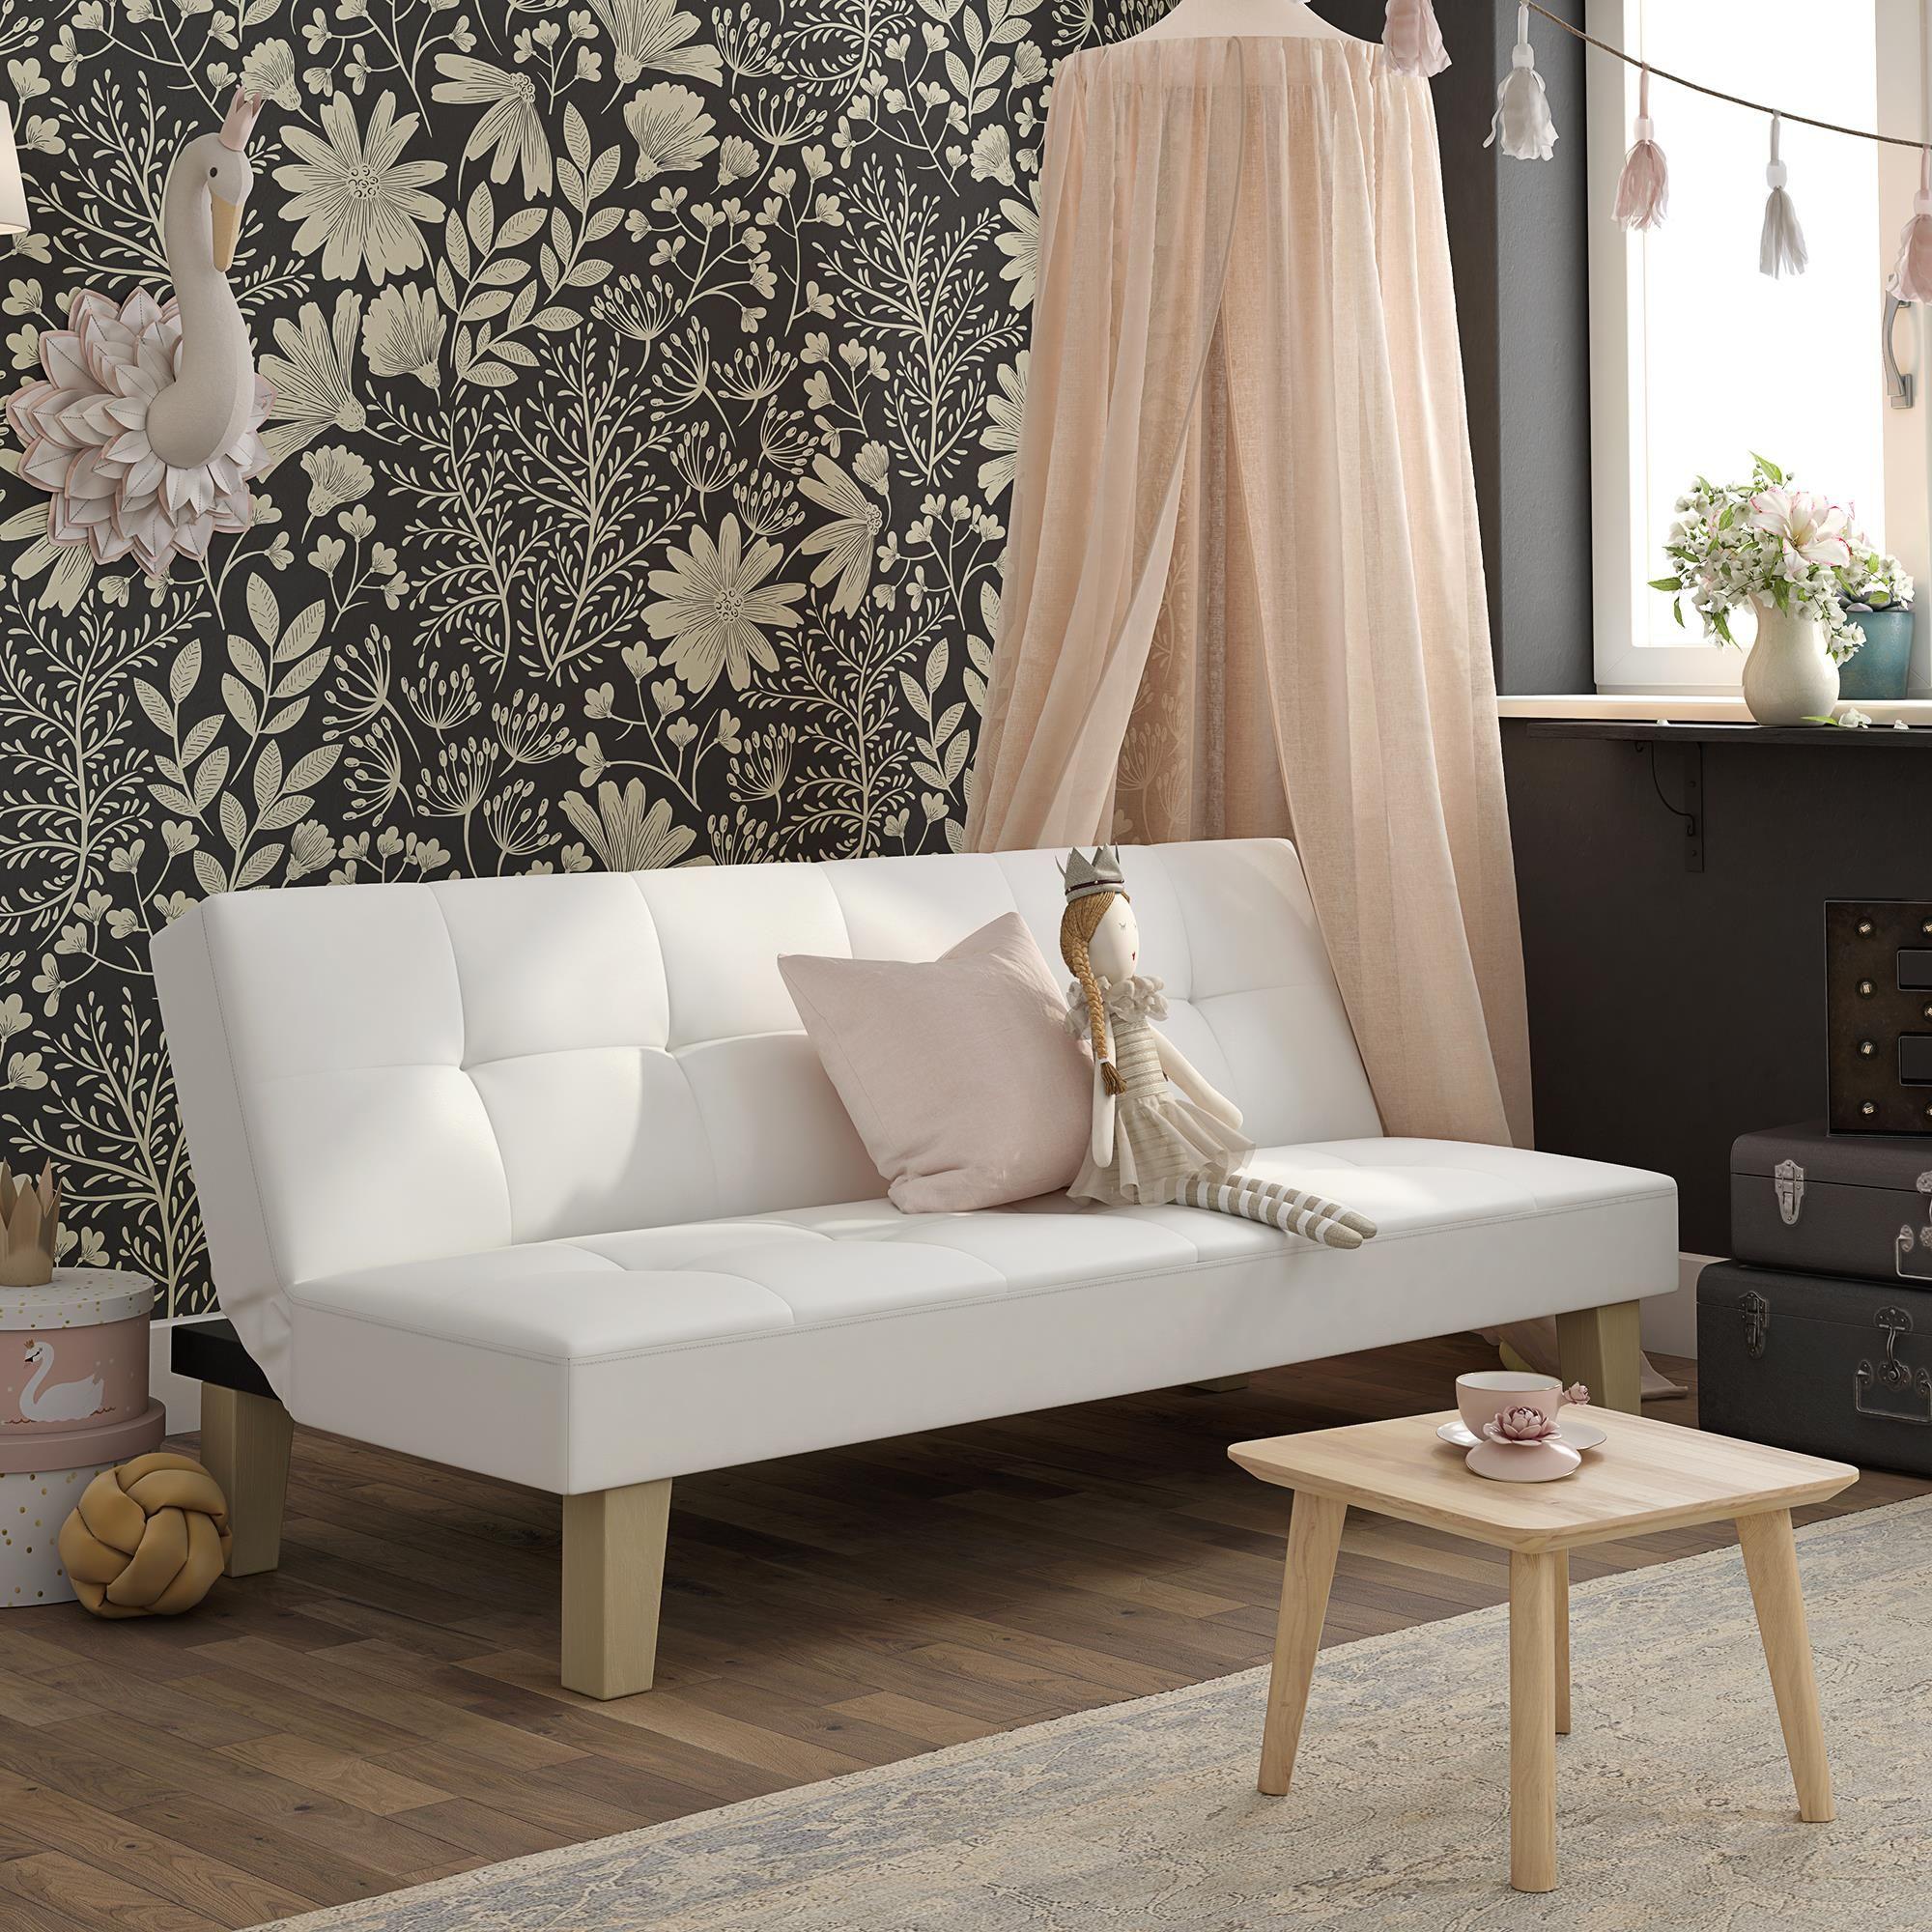 Aria Futon Sofa Bed White Walmart Com In 2020 Futon Living Room White Sofa Bed Sofa Bed